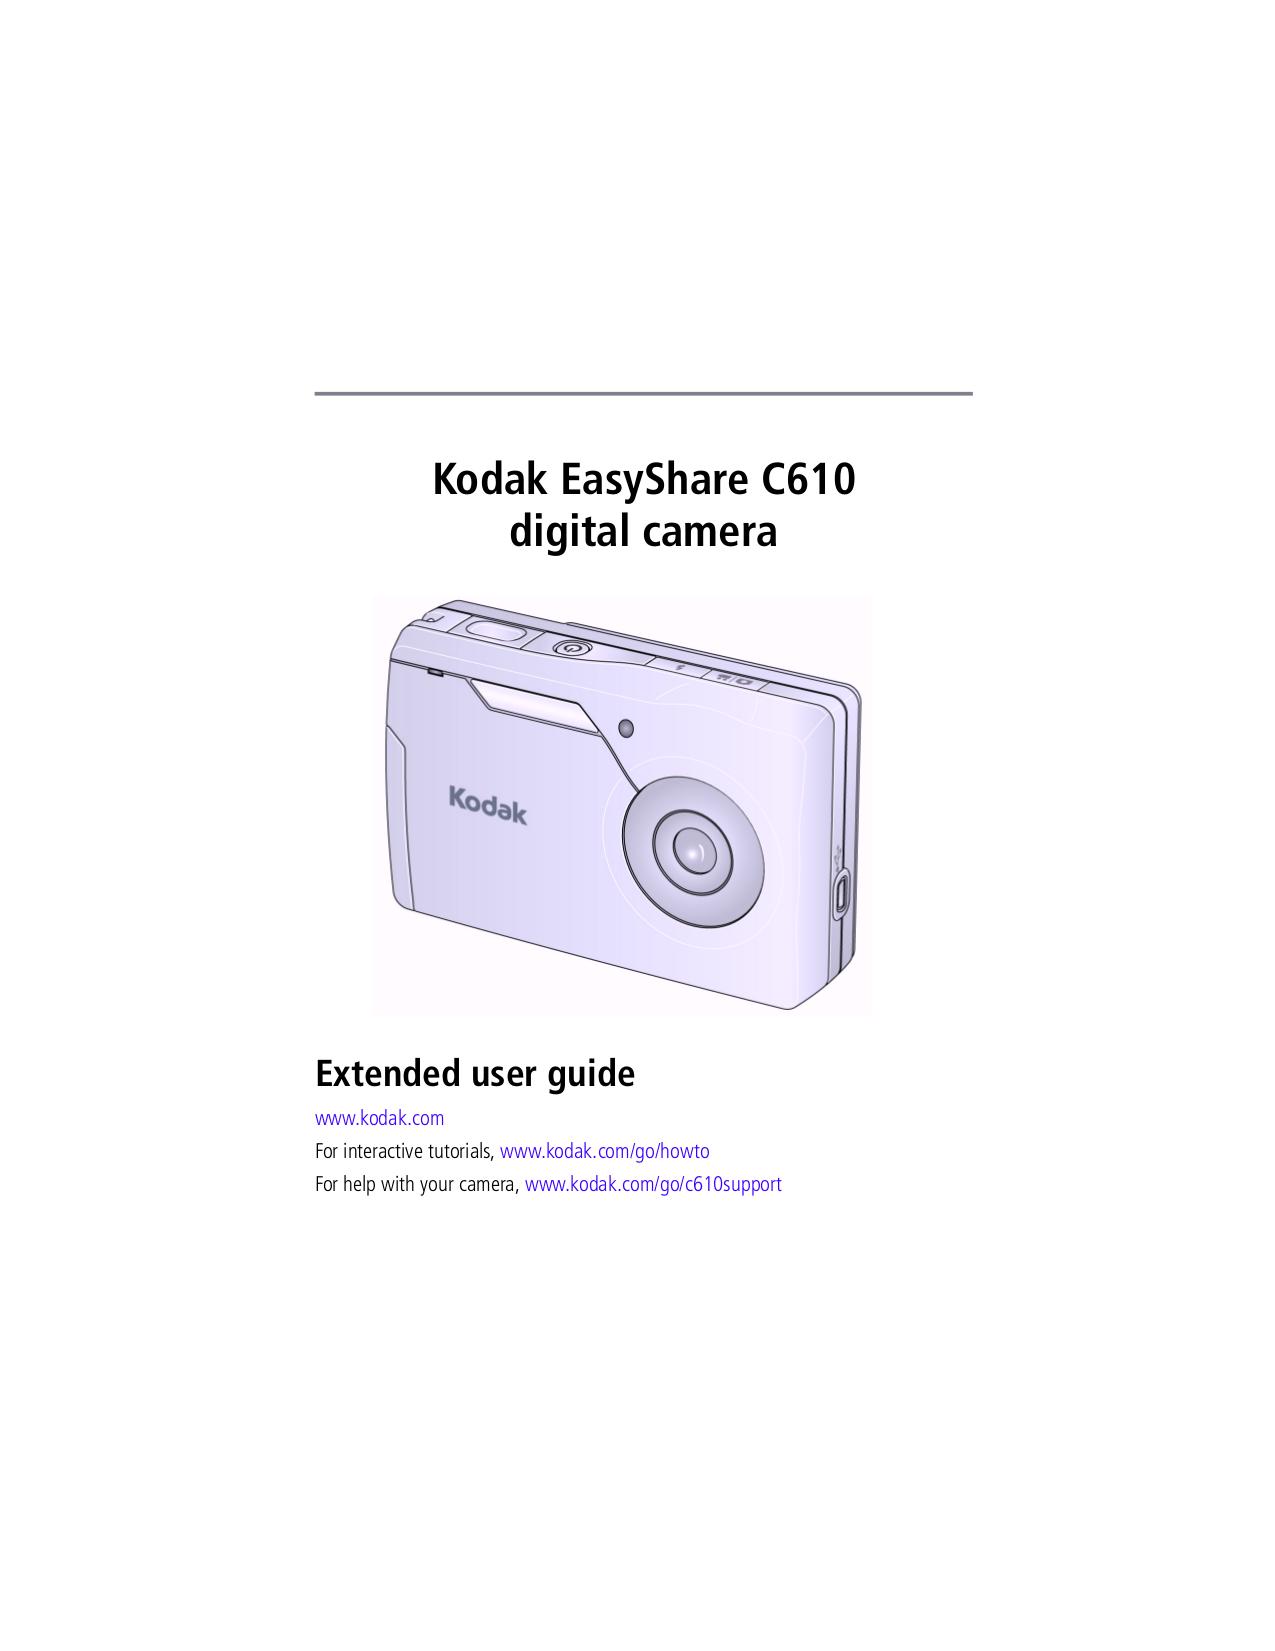 Manual fotografie digitala pdf 95